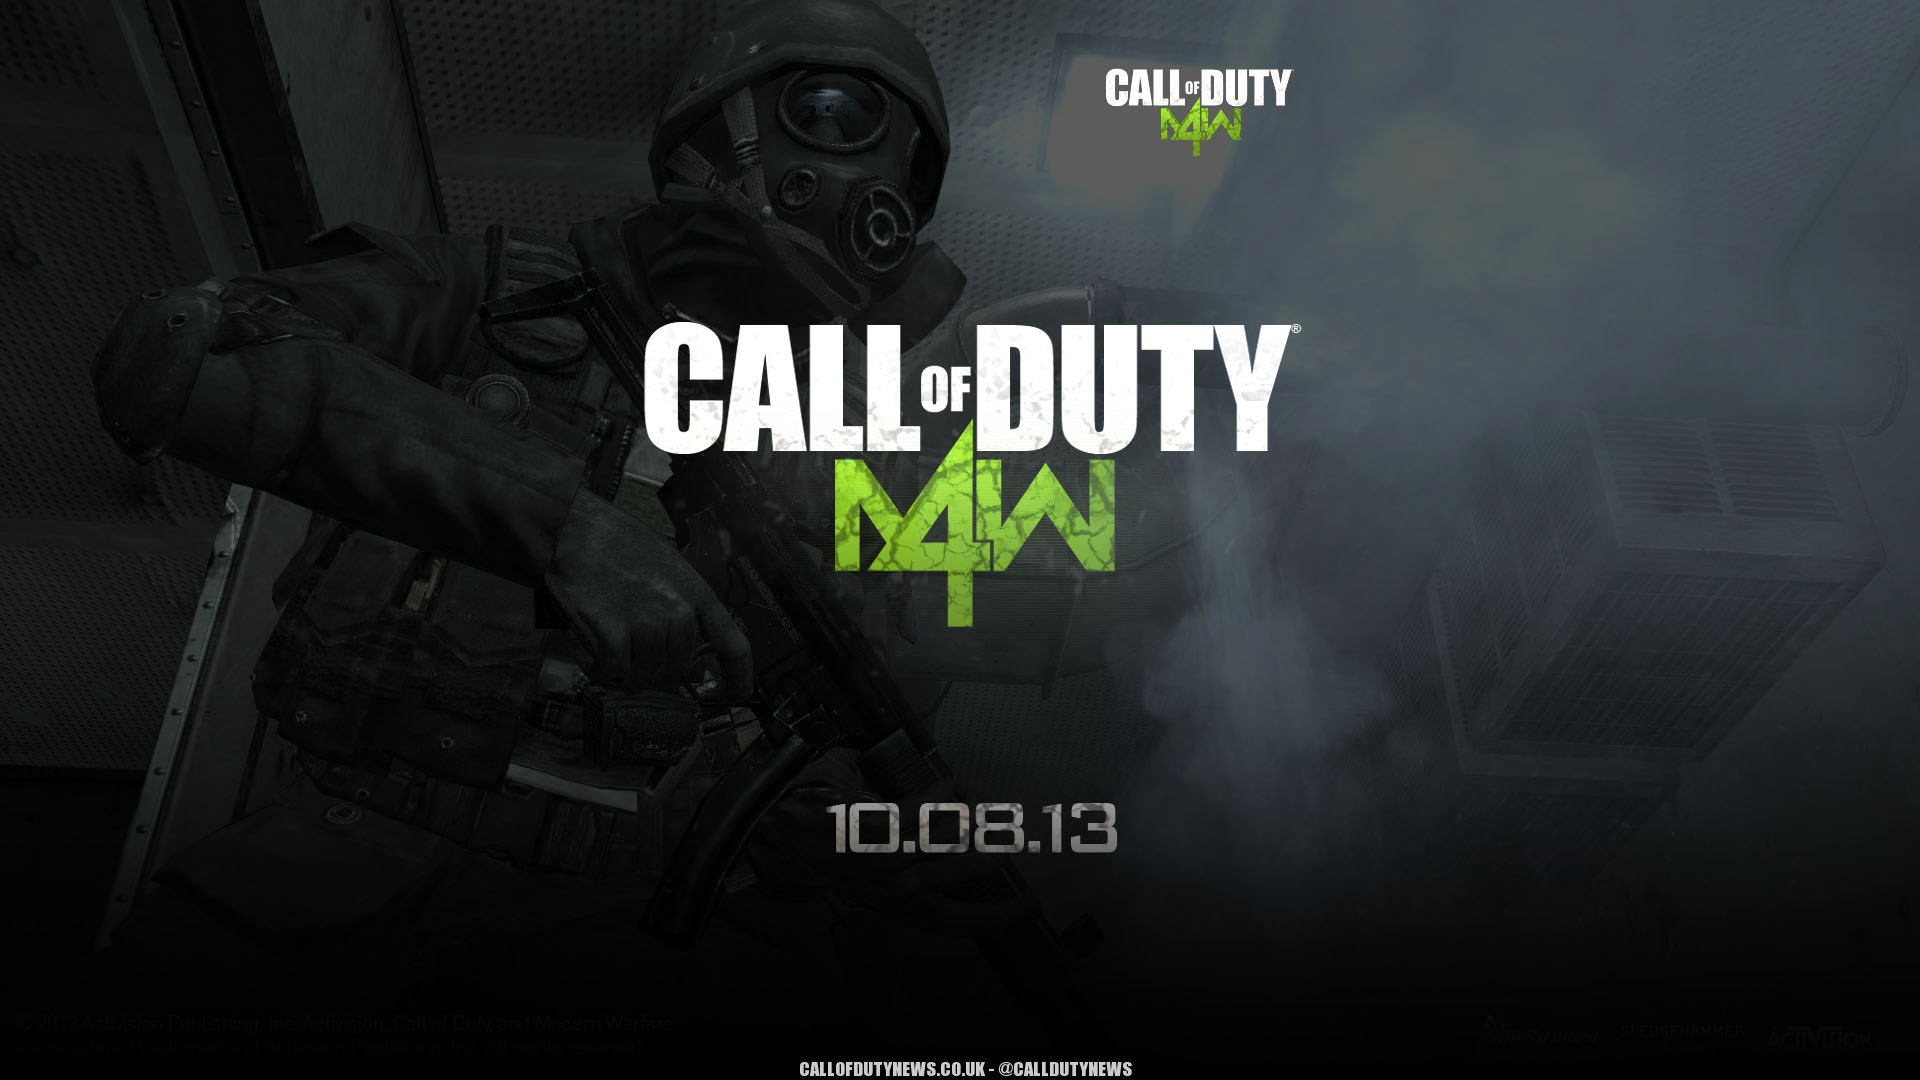 mw4 modern warfare 4 wallpaper 3 COD 2014 بسیار بهتر از Ghosts خواهد بود